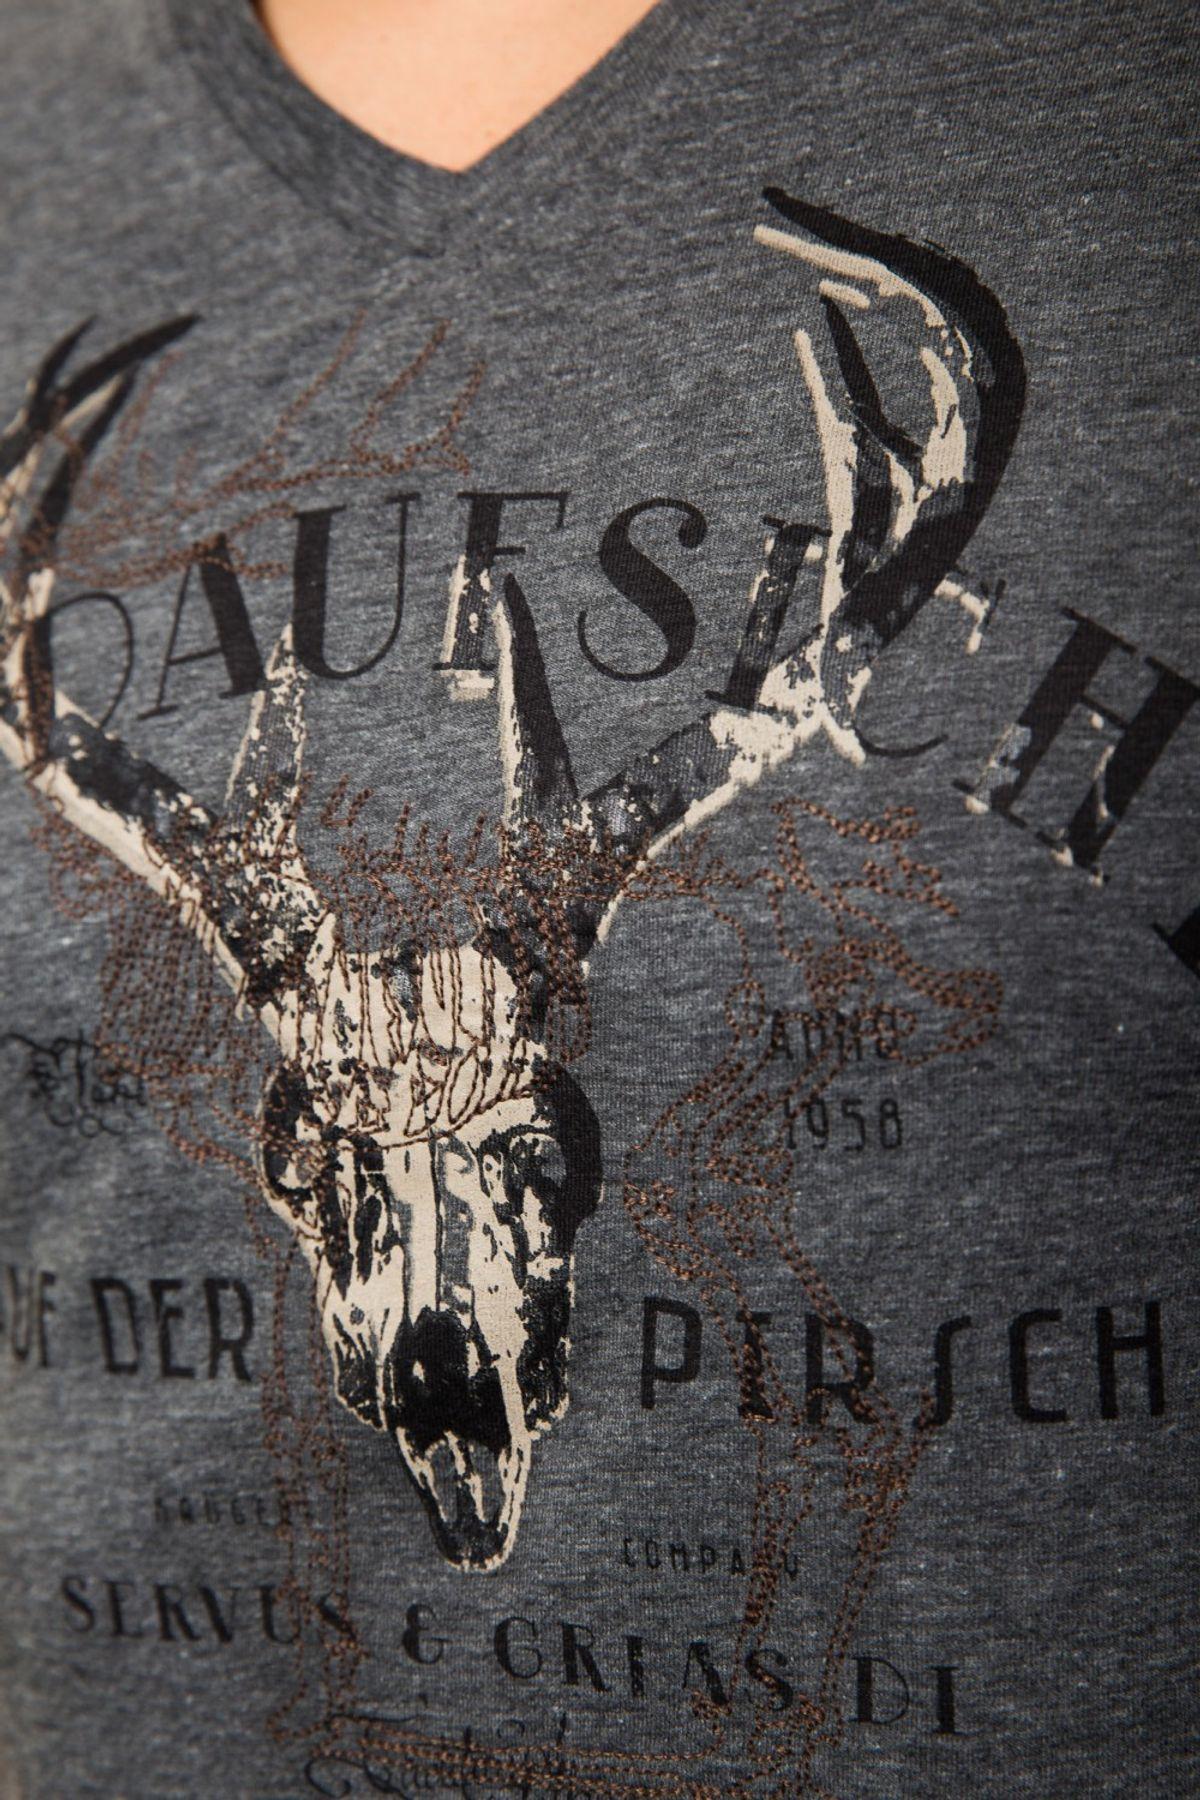 Krüger - Herren Trachten T-Shirt, Jagdaufsicht (Artikelnummer: 93205-41) – Bild 4